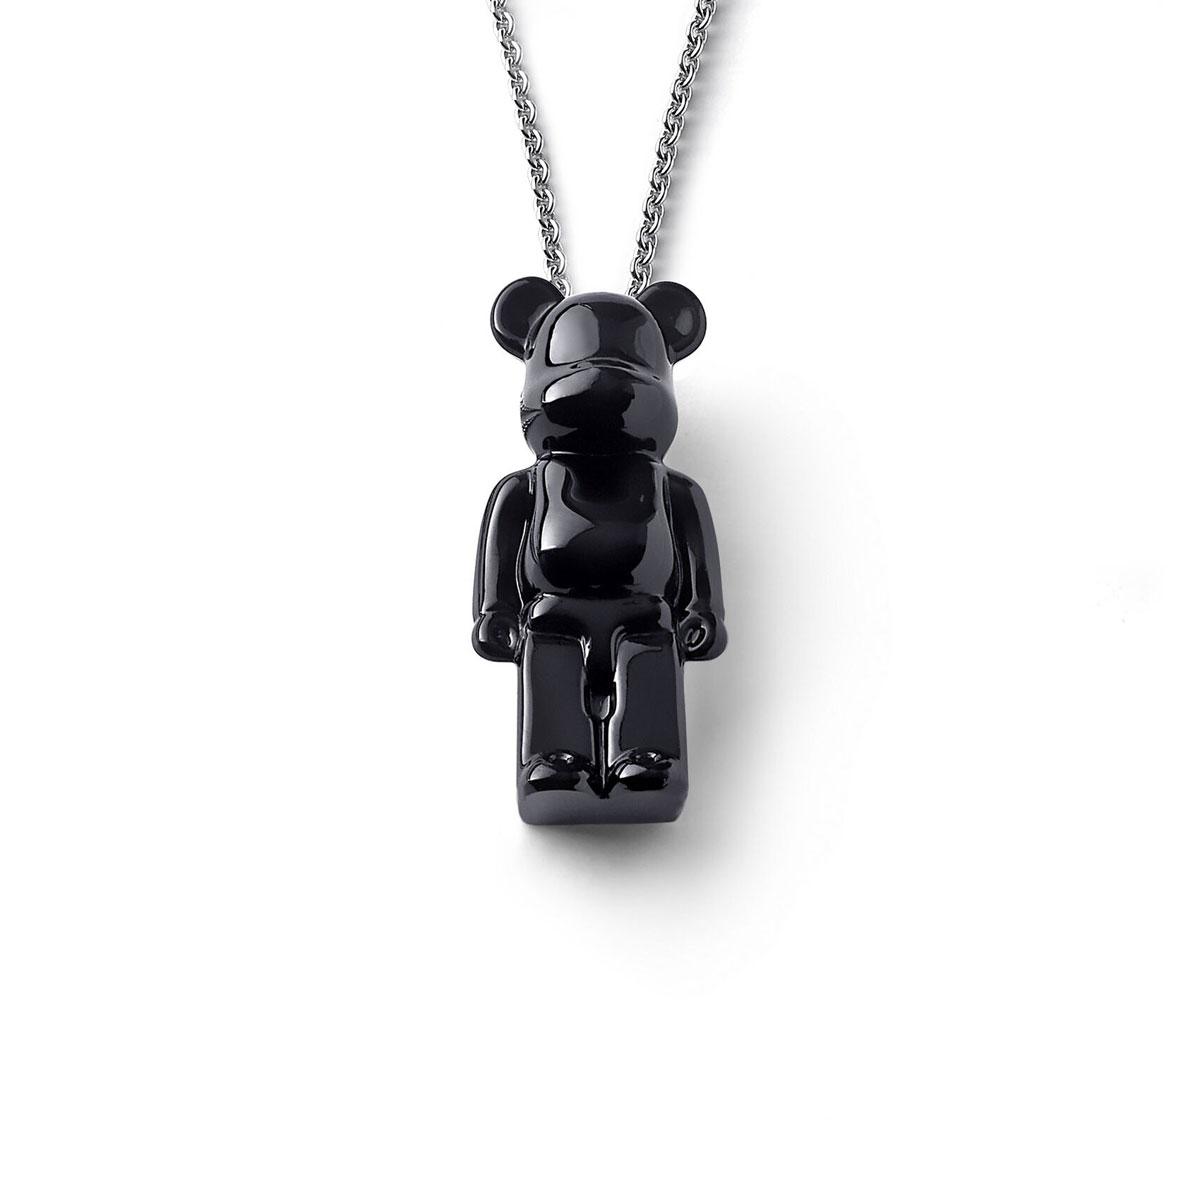 Baccarat BearBrick Long Necklace, Silver, Black Crystal